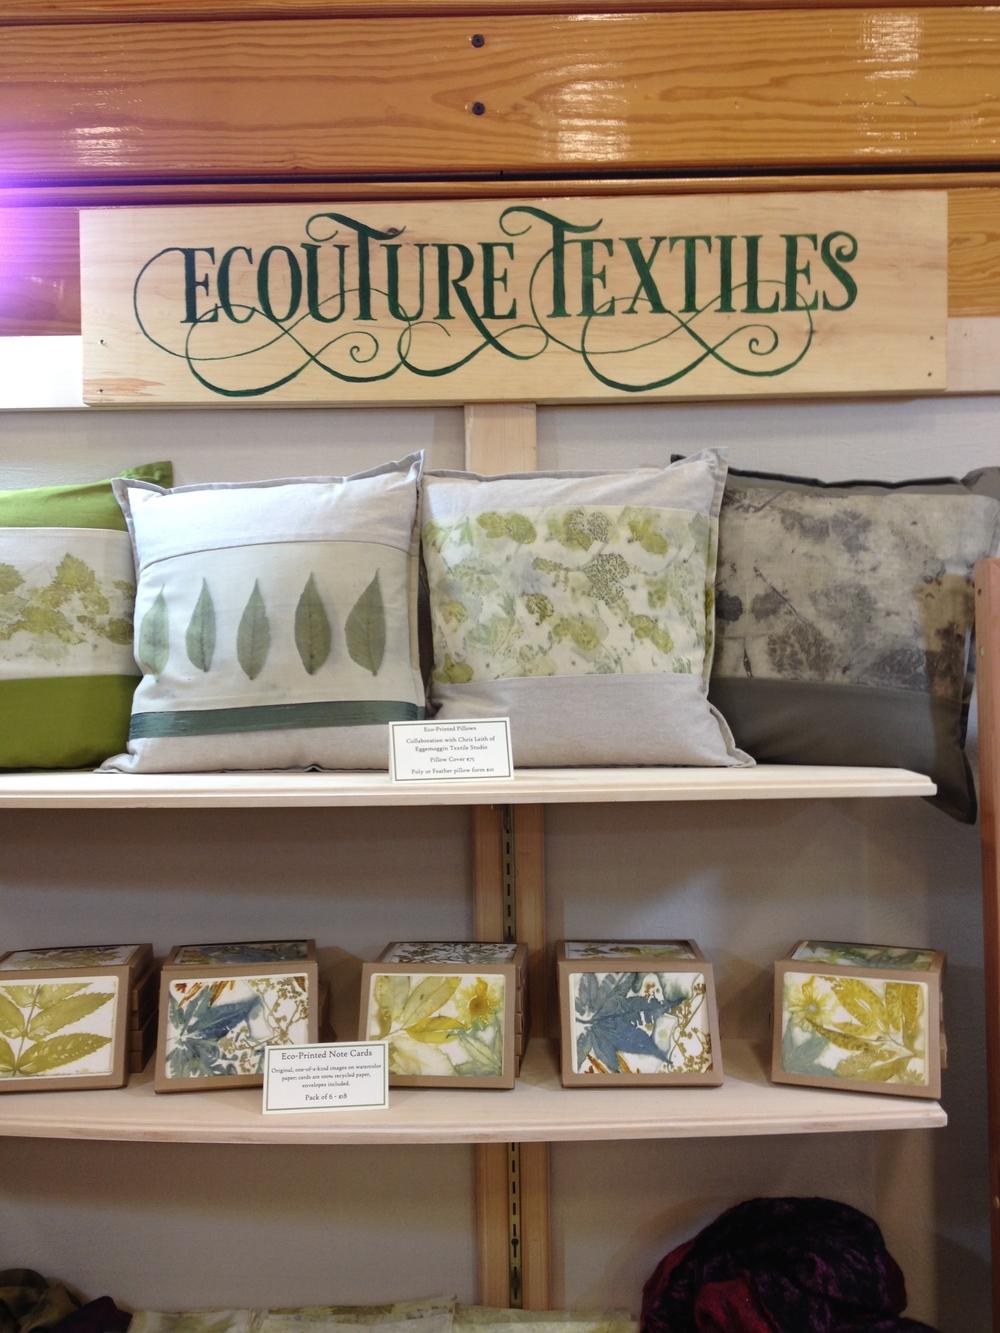 Ecouture Textile Studio Show Booth